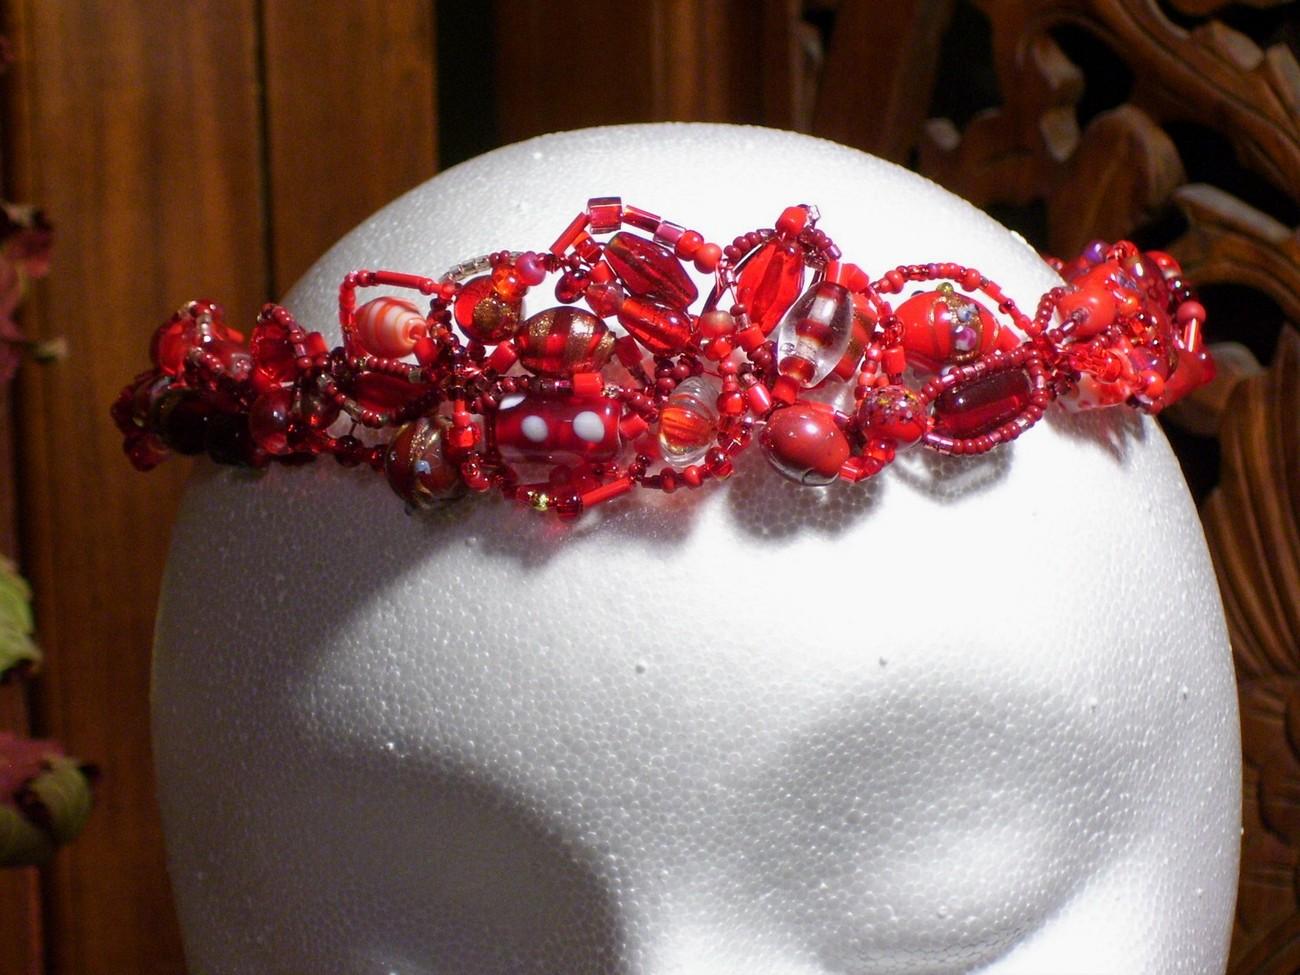 Crimson goddess